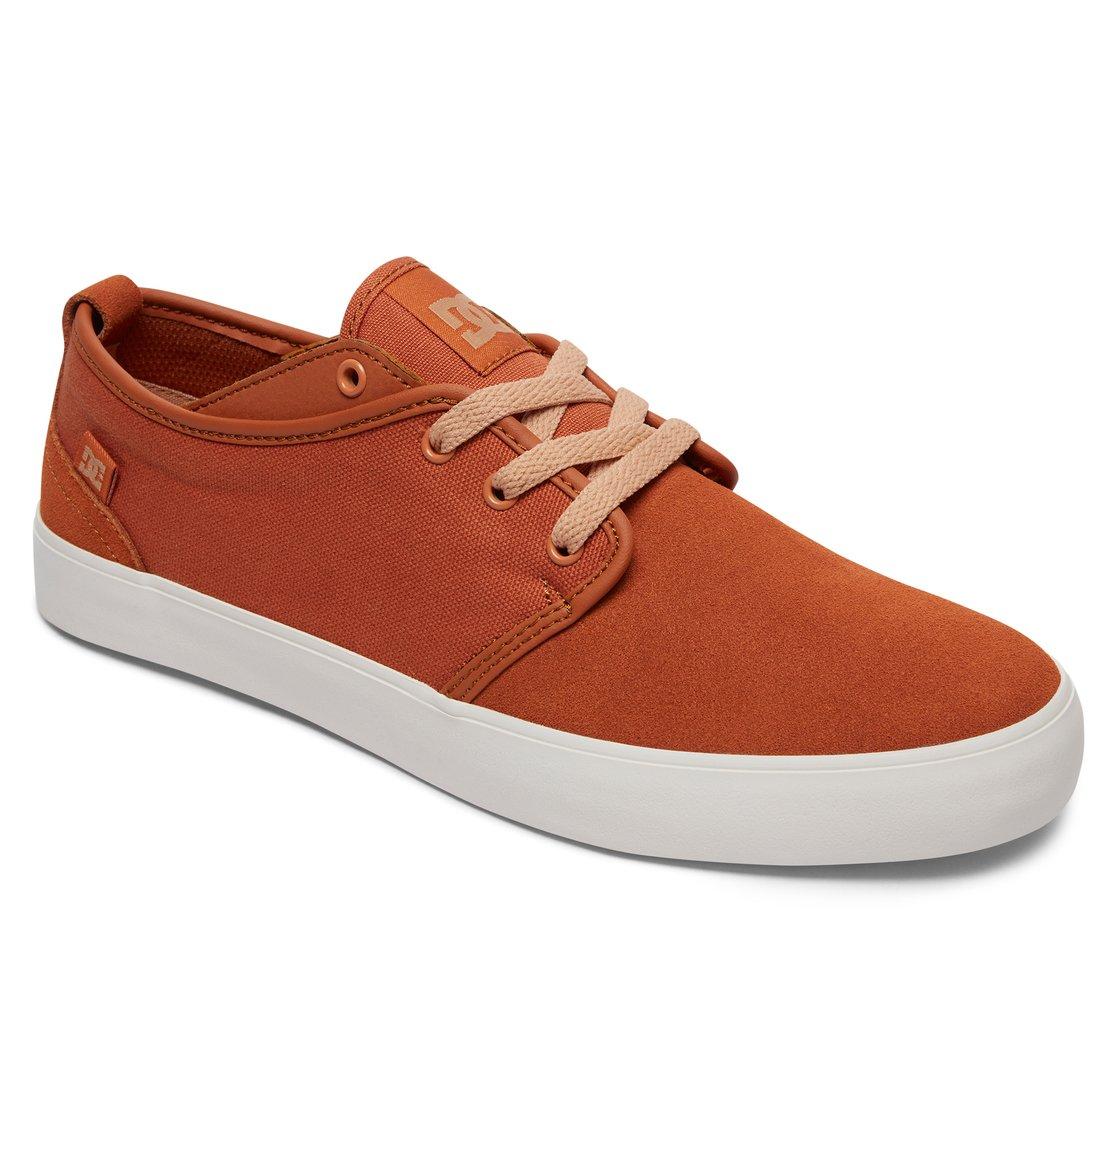 Zapatos marrones DC Shoes Kremer para hombre